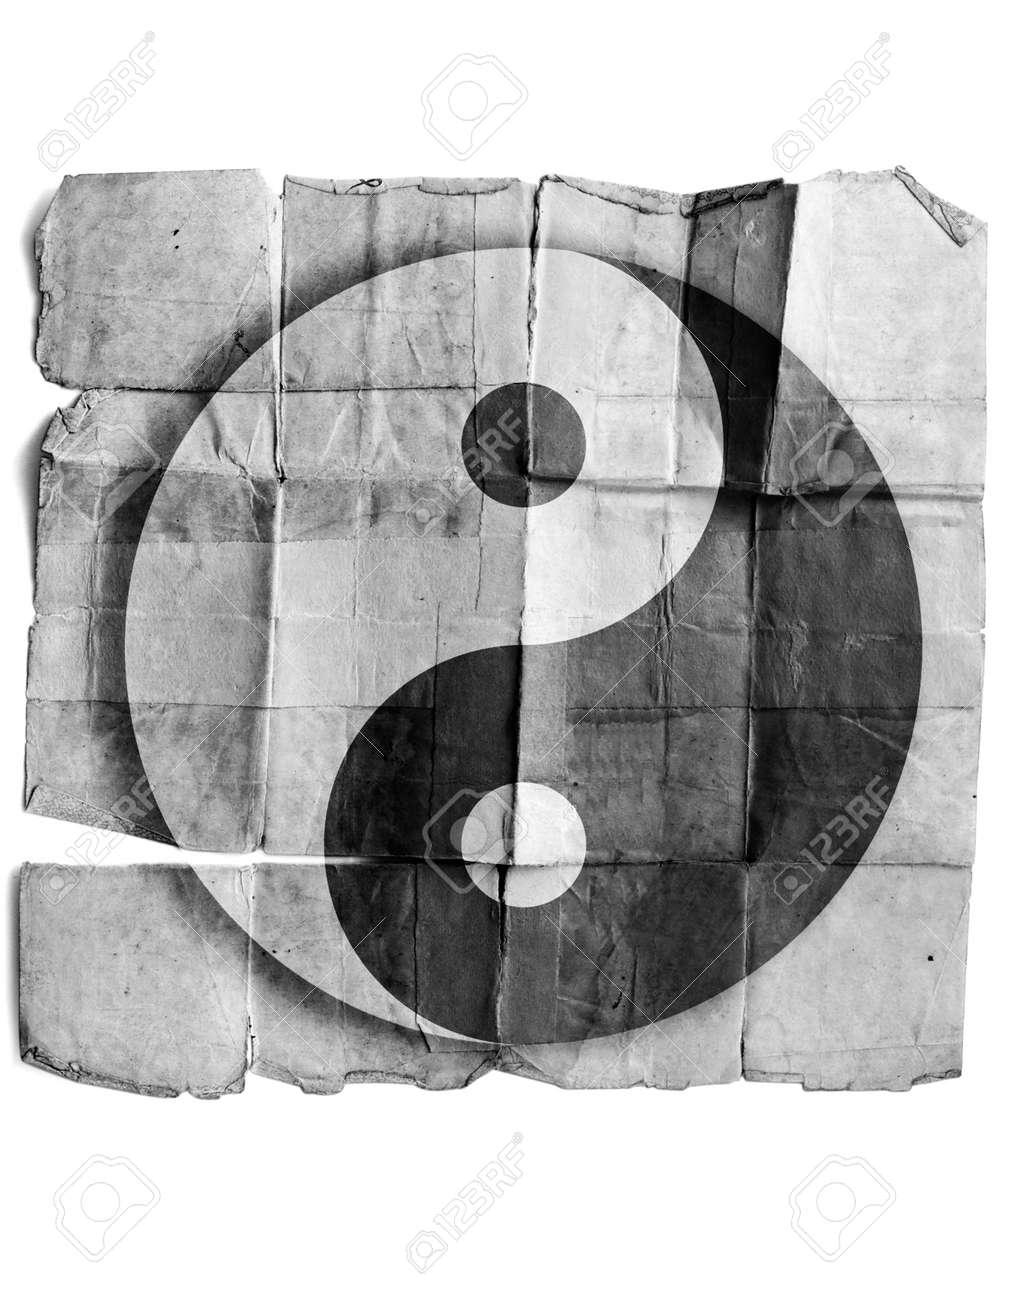 Ying yang symbol Stock Photo - 17463127